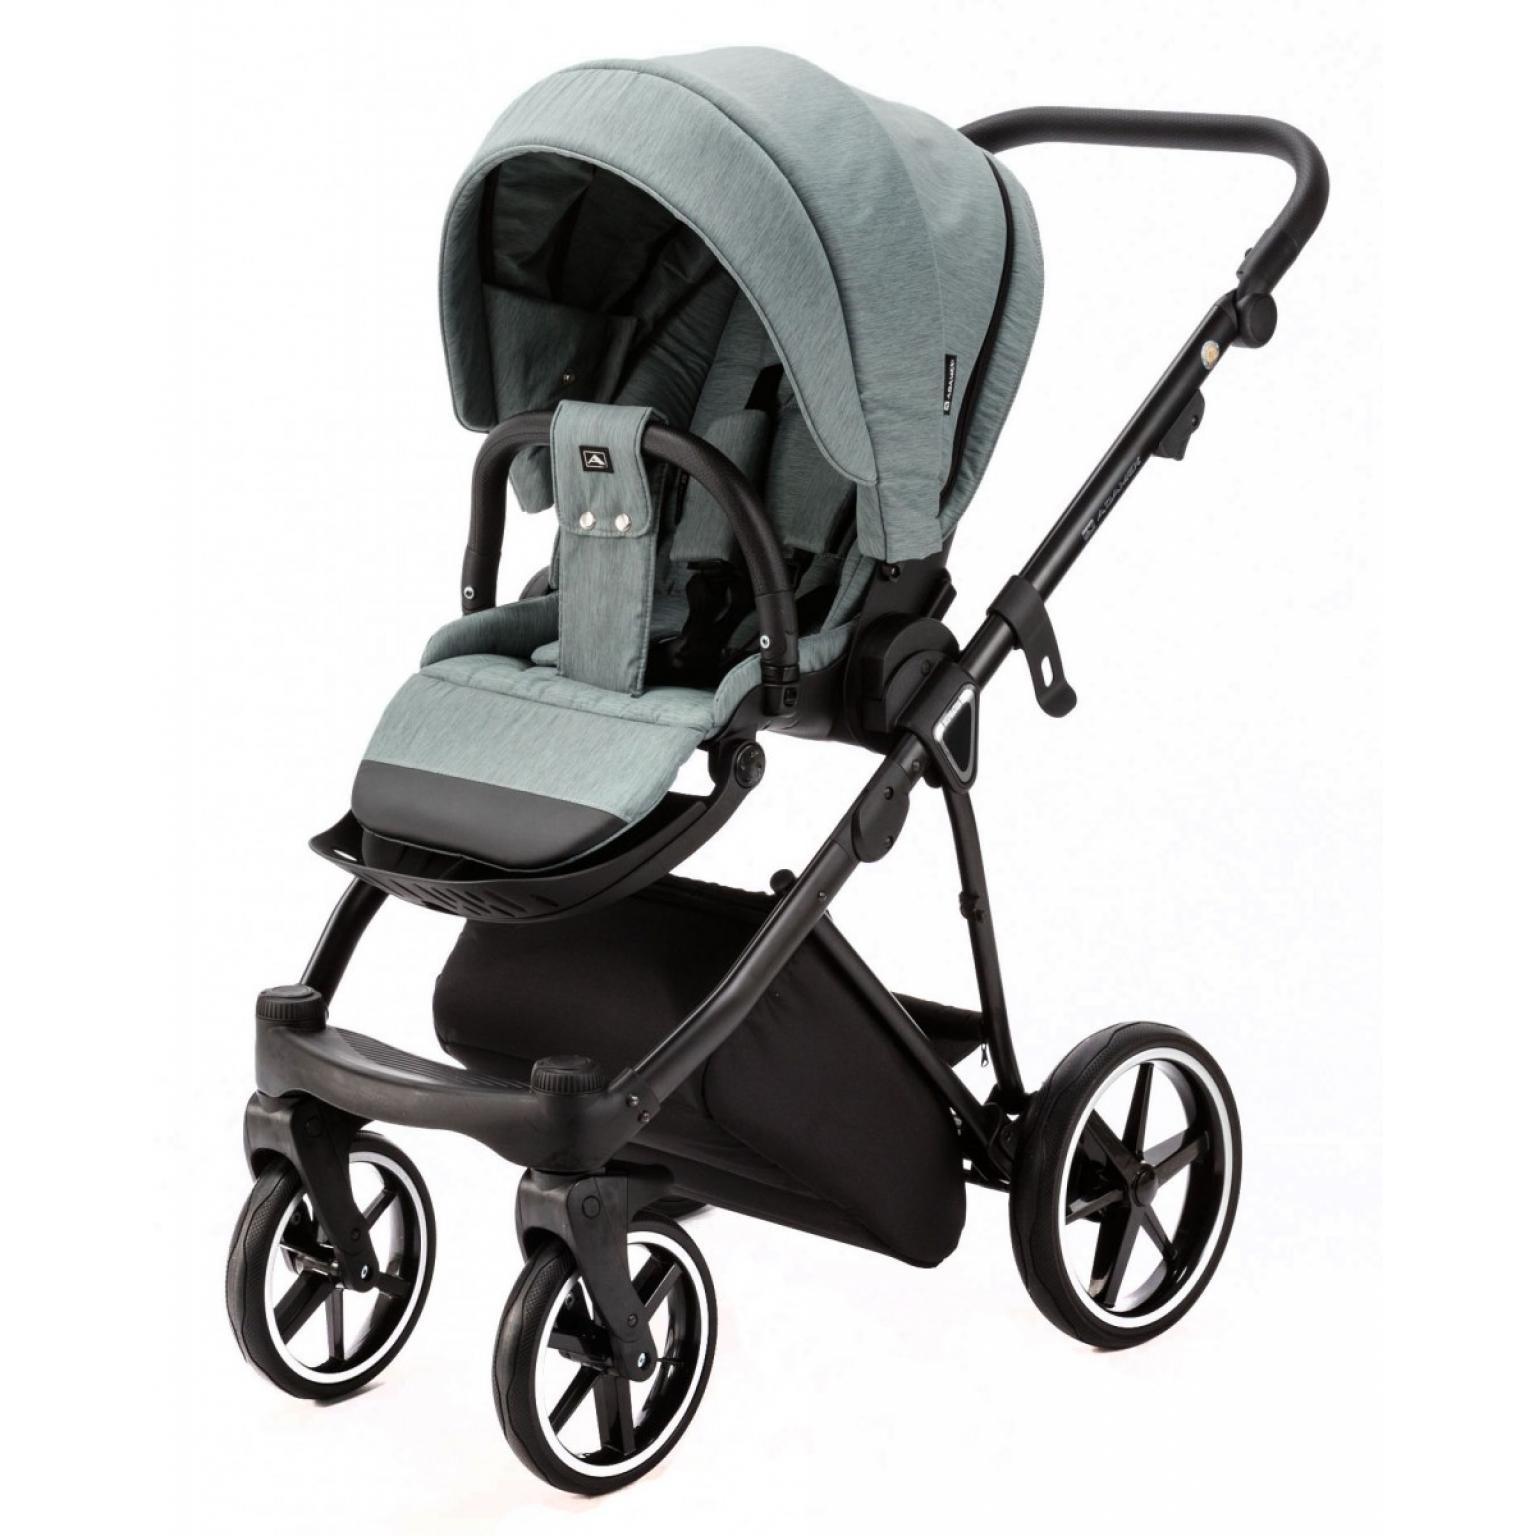 Bērnu-rati-ADAMEX-BELISSA-Standard-PS-63-Latvija-Rīga-детская-коляска-ADAMEX-BELISSA-Standard-PS-63-латвия-рига